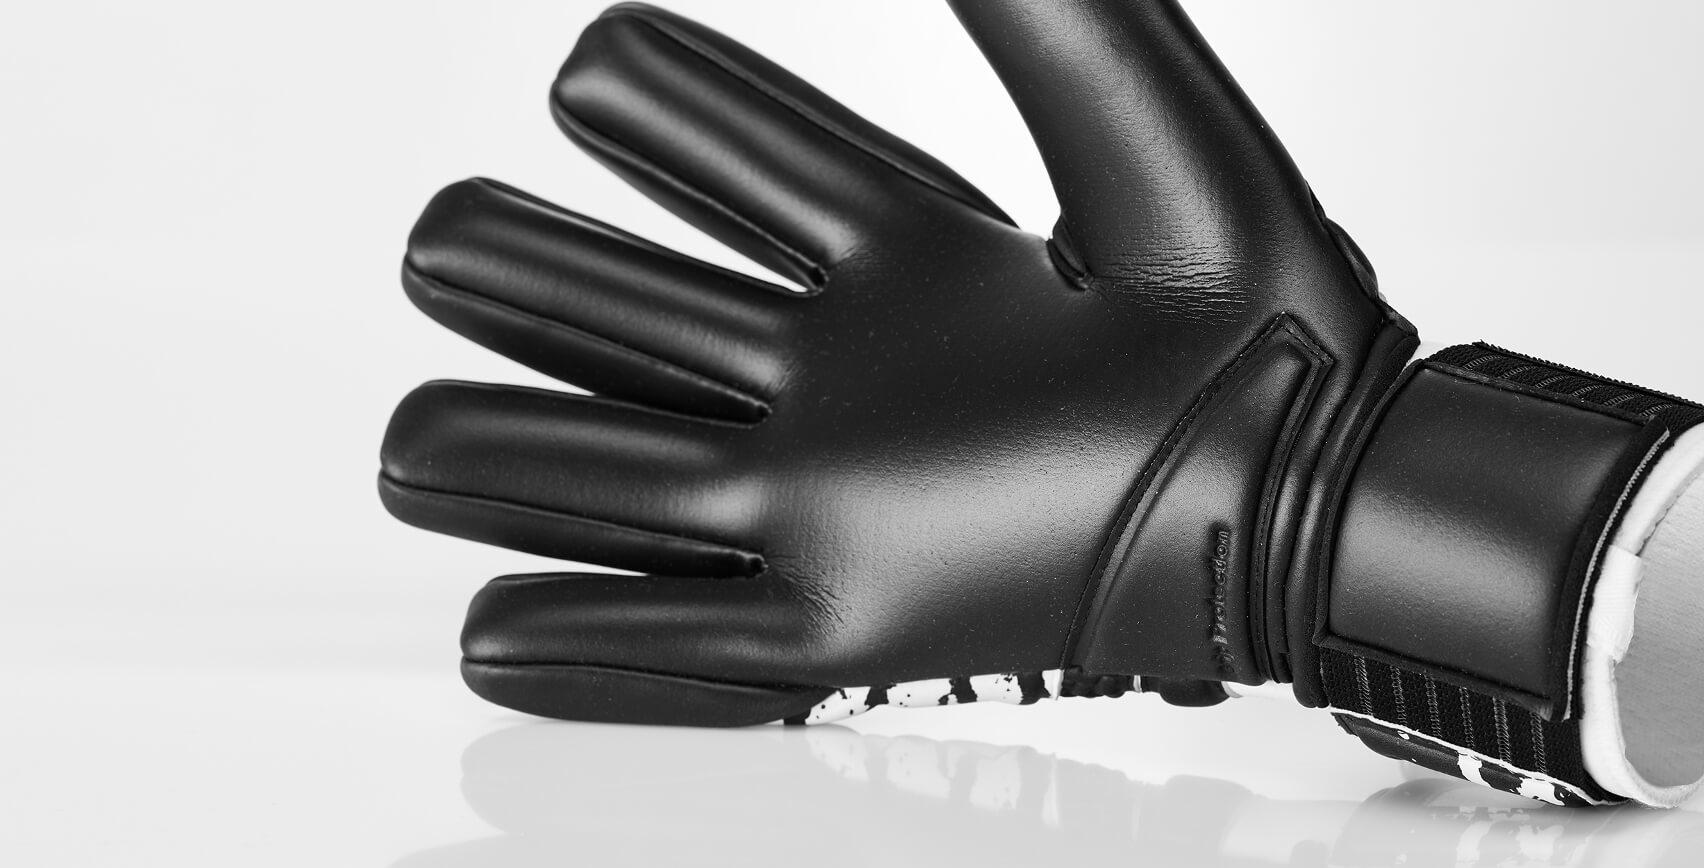 Rebel Gorilla Grip Protection